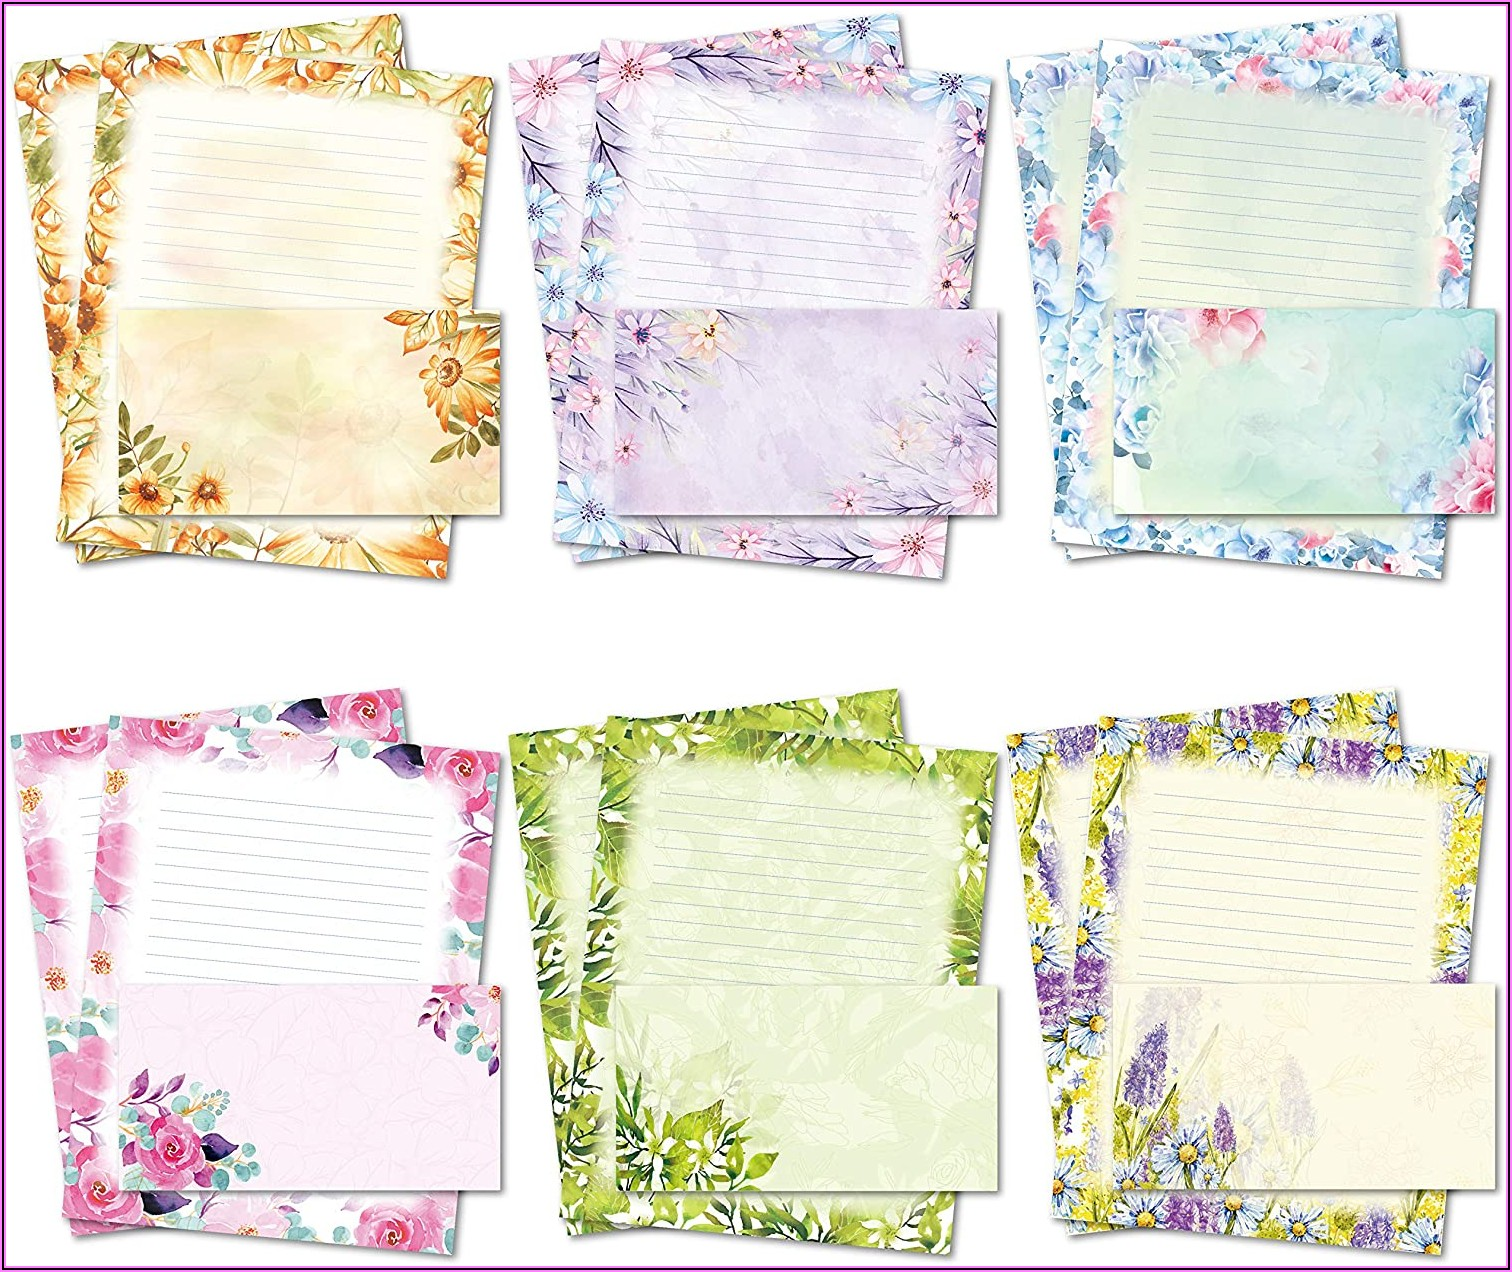 Letter Writing Set With Envelopes